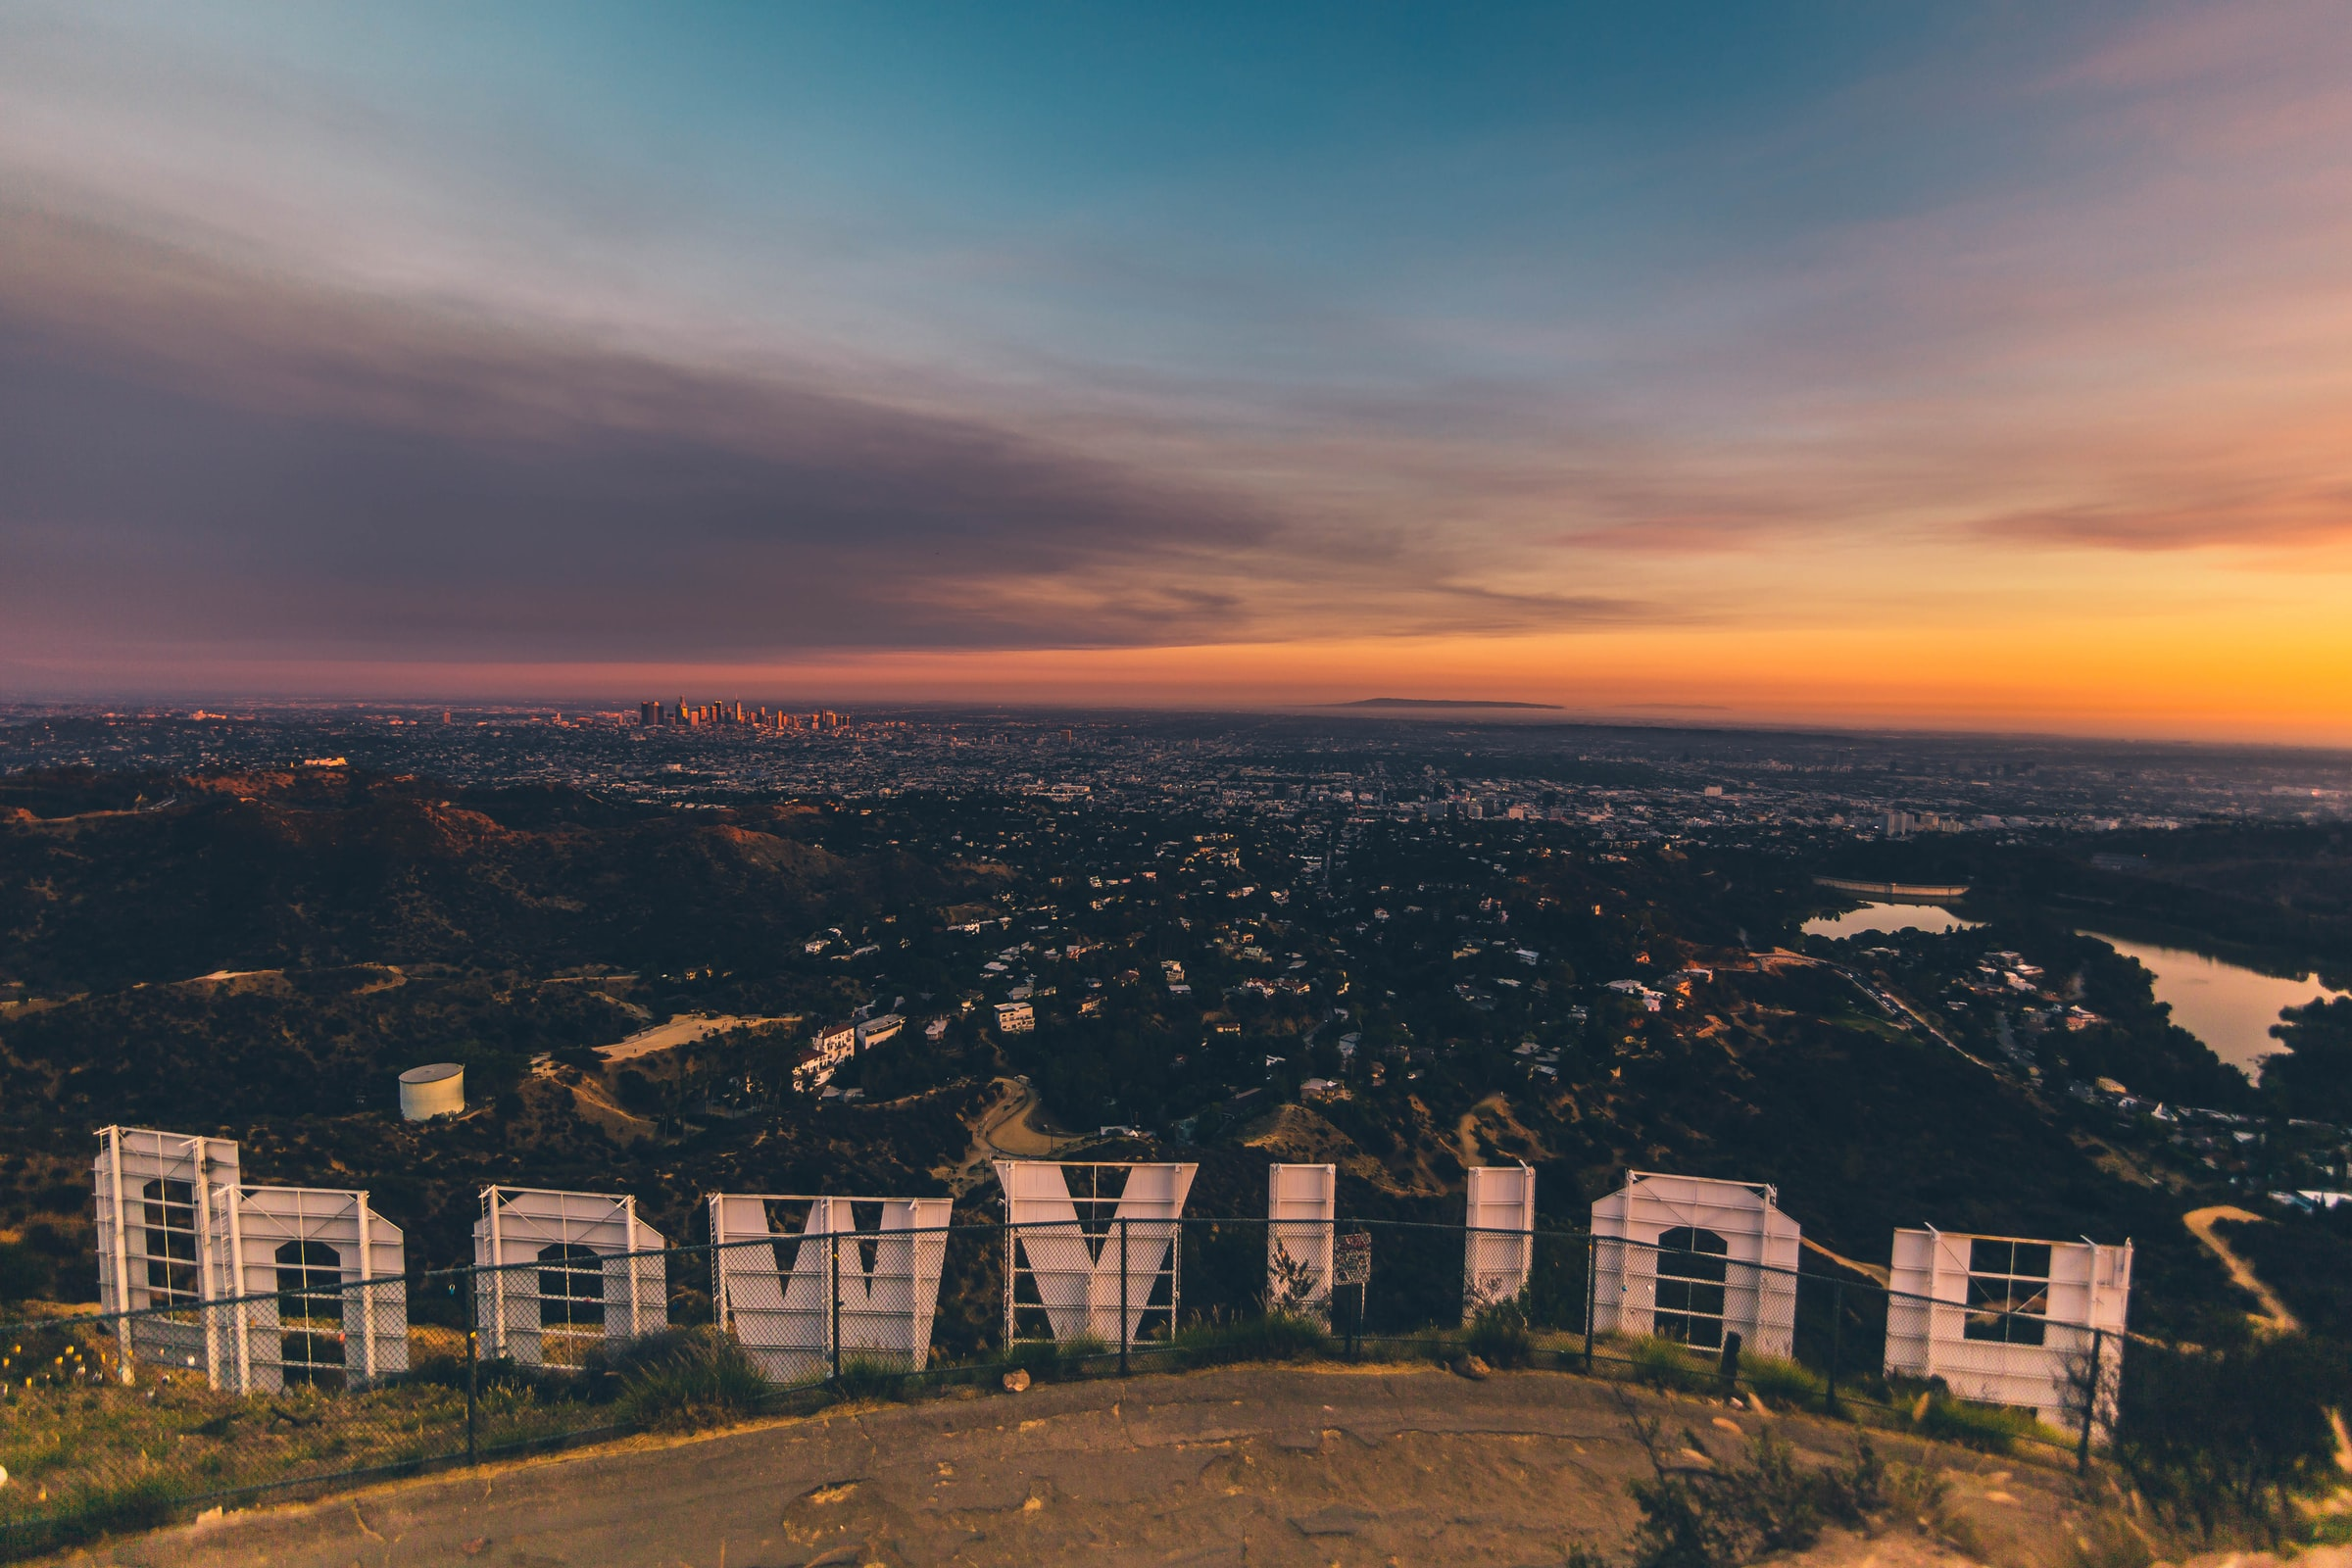 Skyline of Hollywood